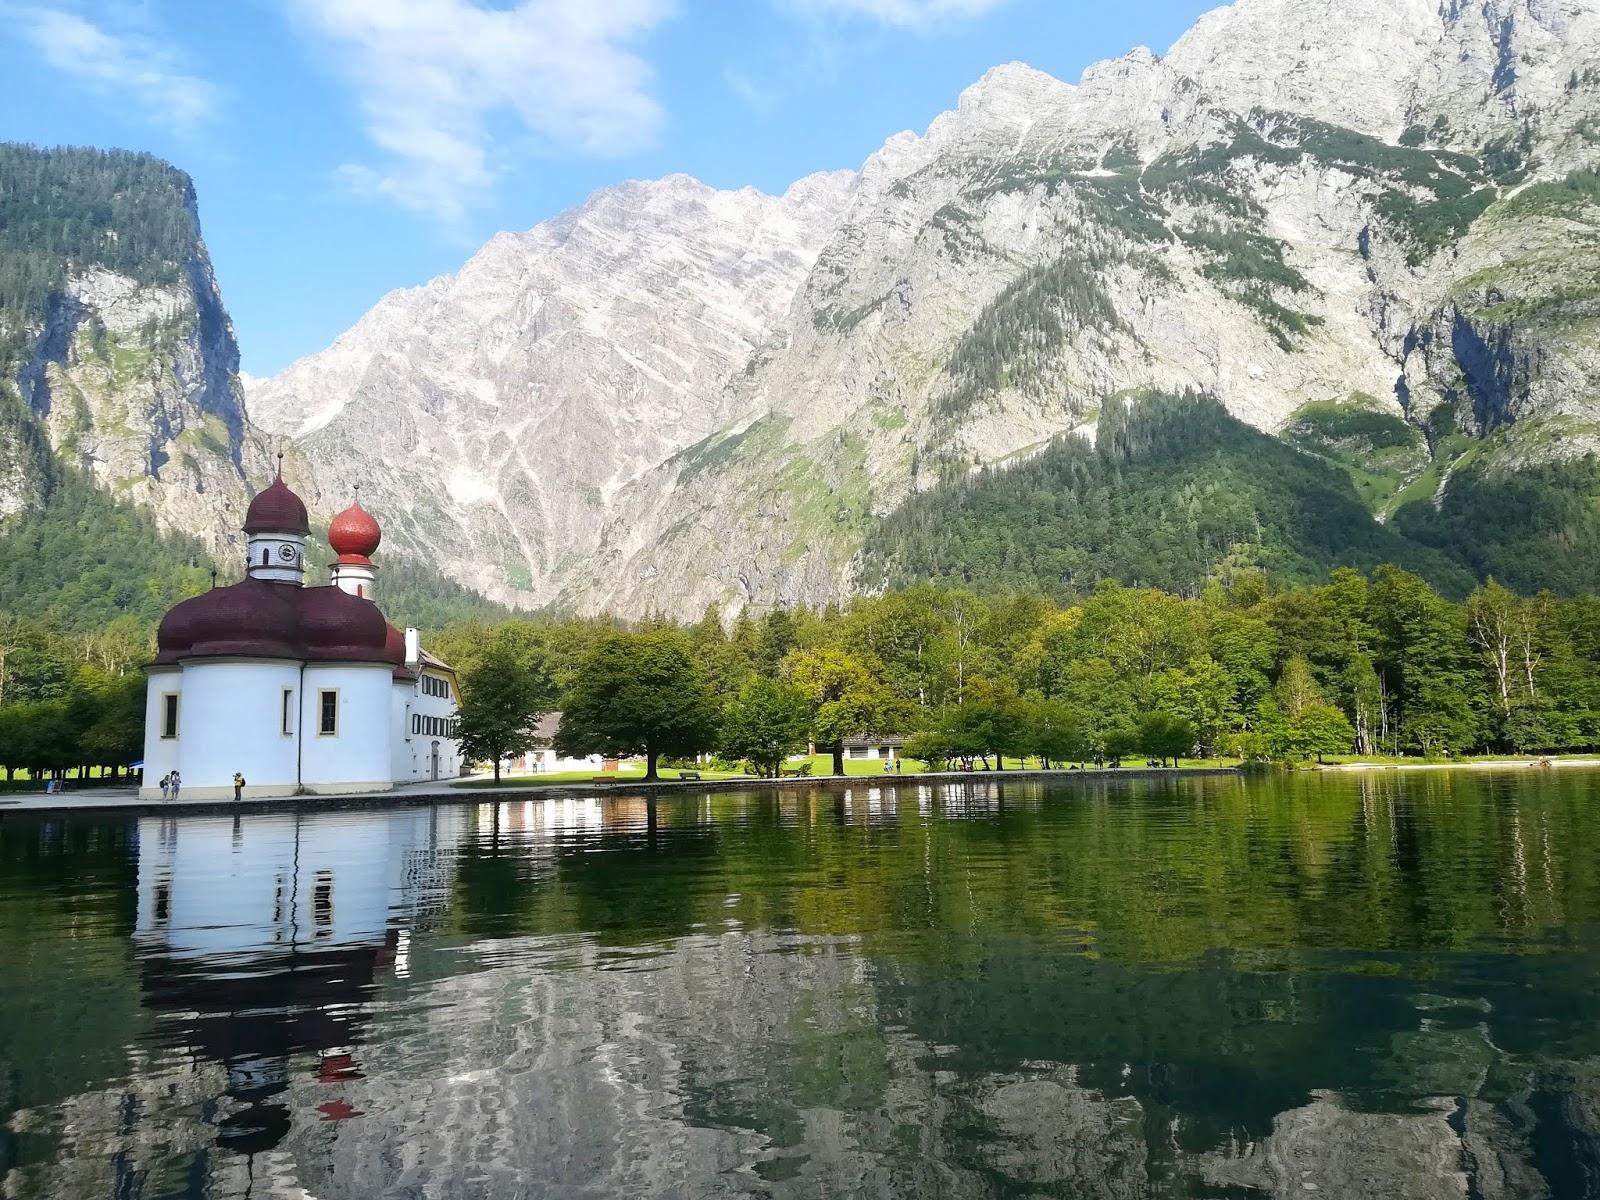 https://zplanembezplanu.blogspot.com/2018/07/jezioro-konigssee-bawarska-perelka.html